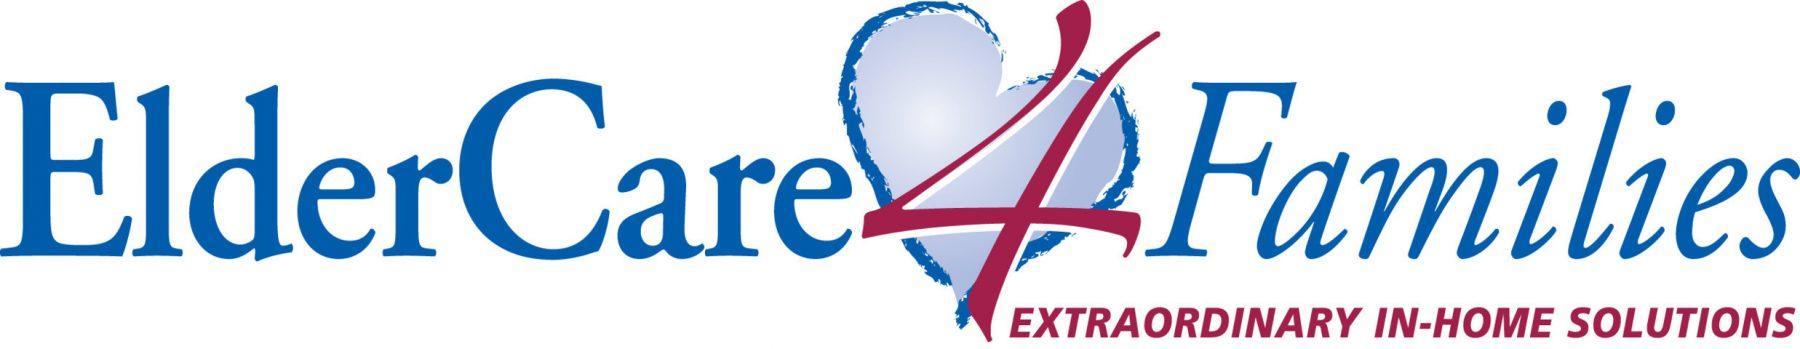 ElderCare4Families Logo